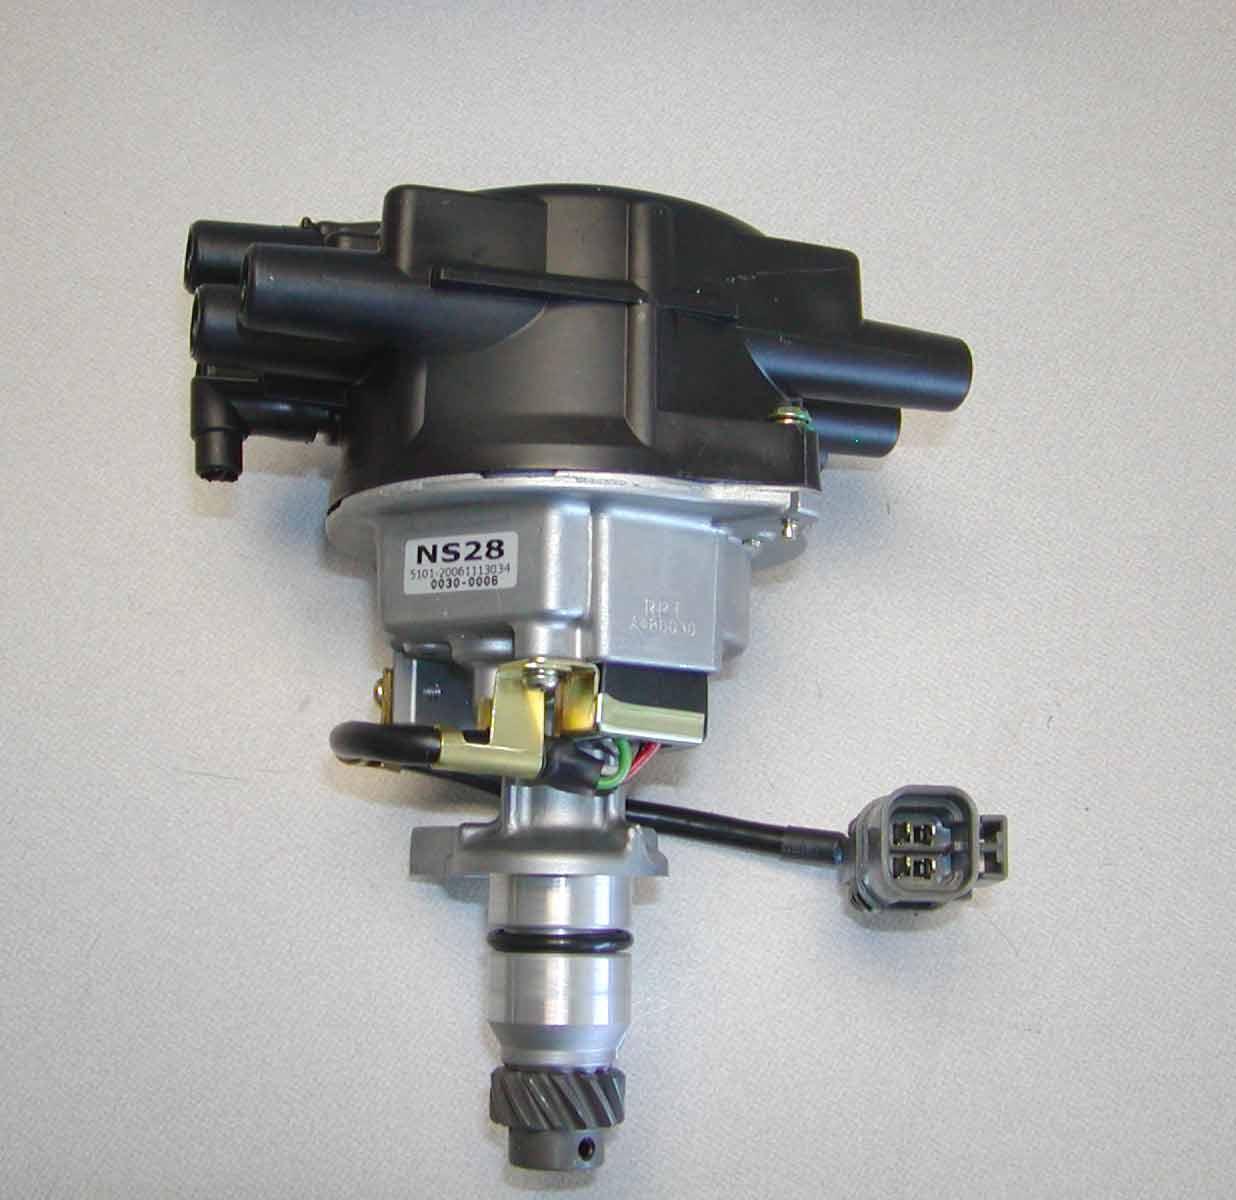 86 300zx turbo distributor - Nissan : Datsun ZCar forum ...